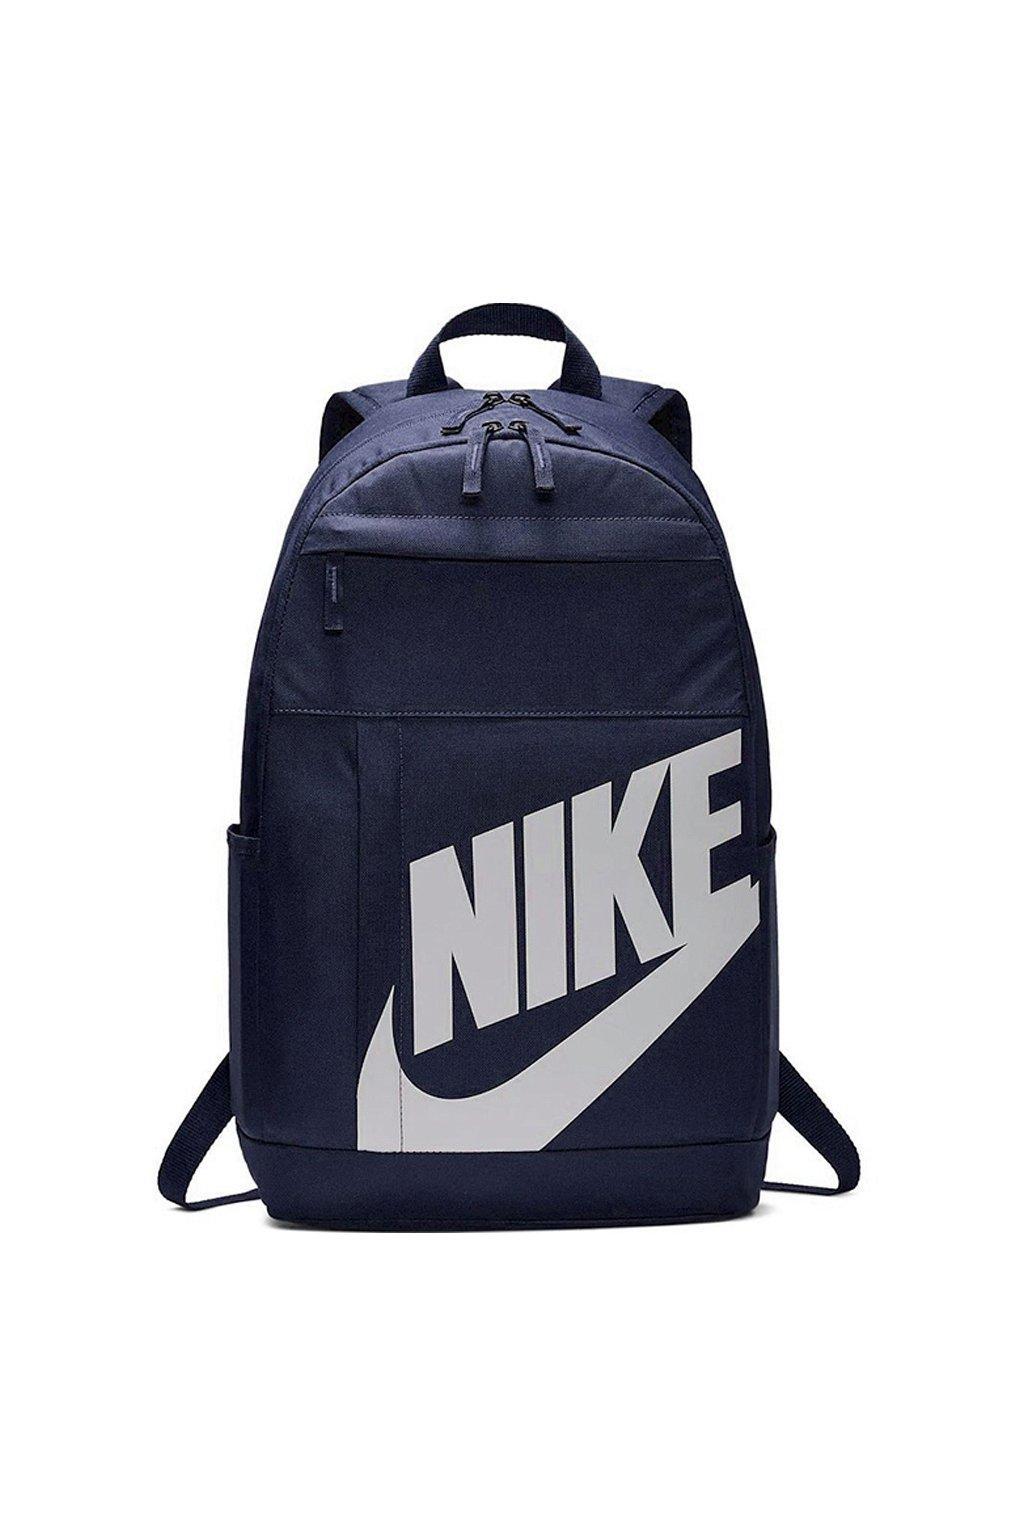 Batoh Nike Elemental BKPK 2.0 tmavomodrý BA5876 451